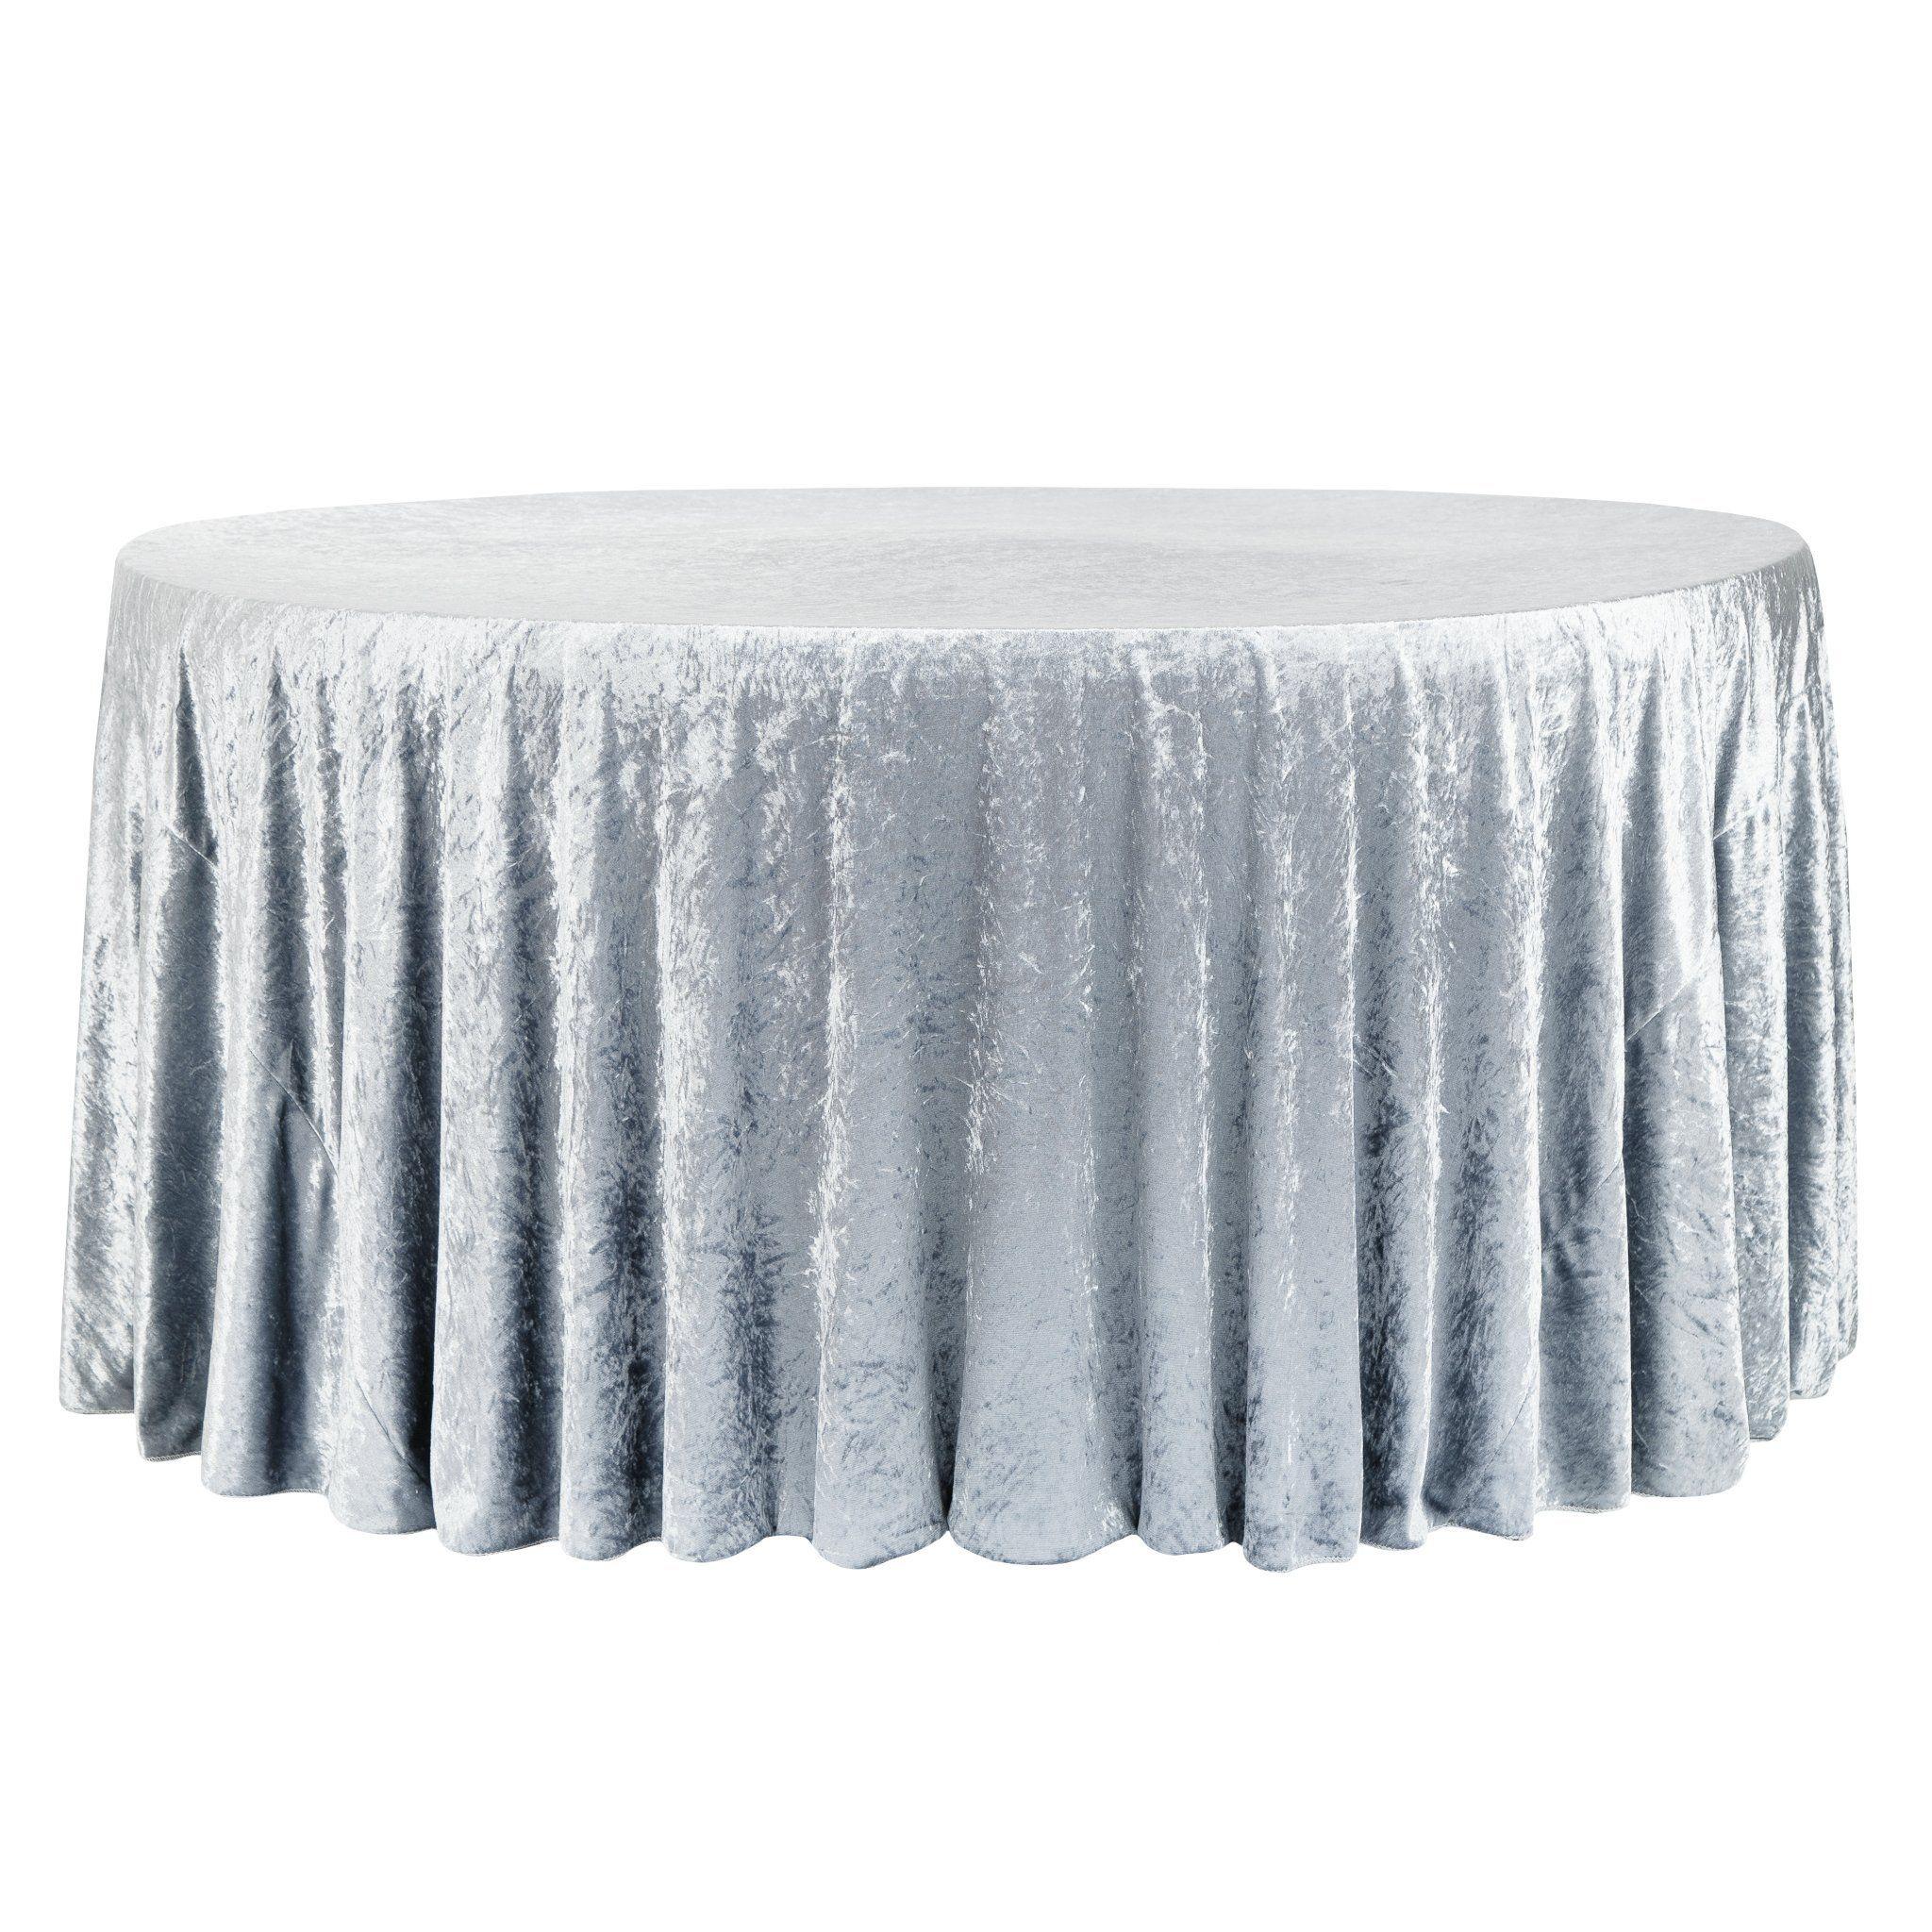 "Velvet 132"" Round Tablecloth - Dusty Blue"